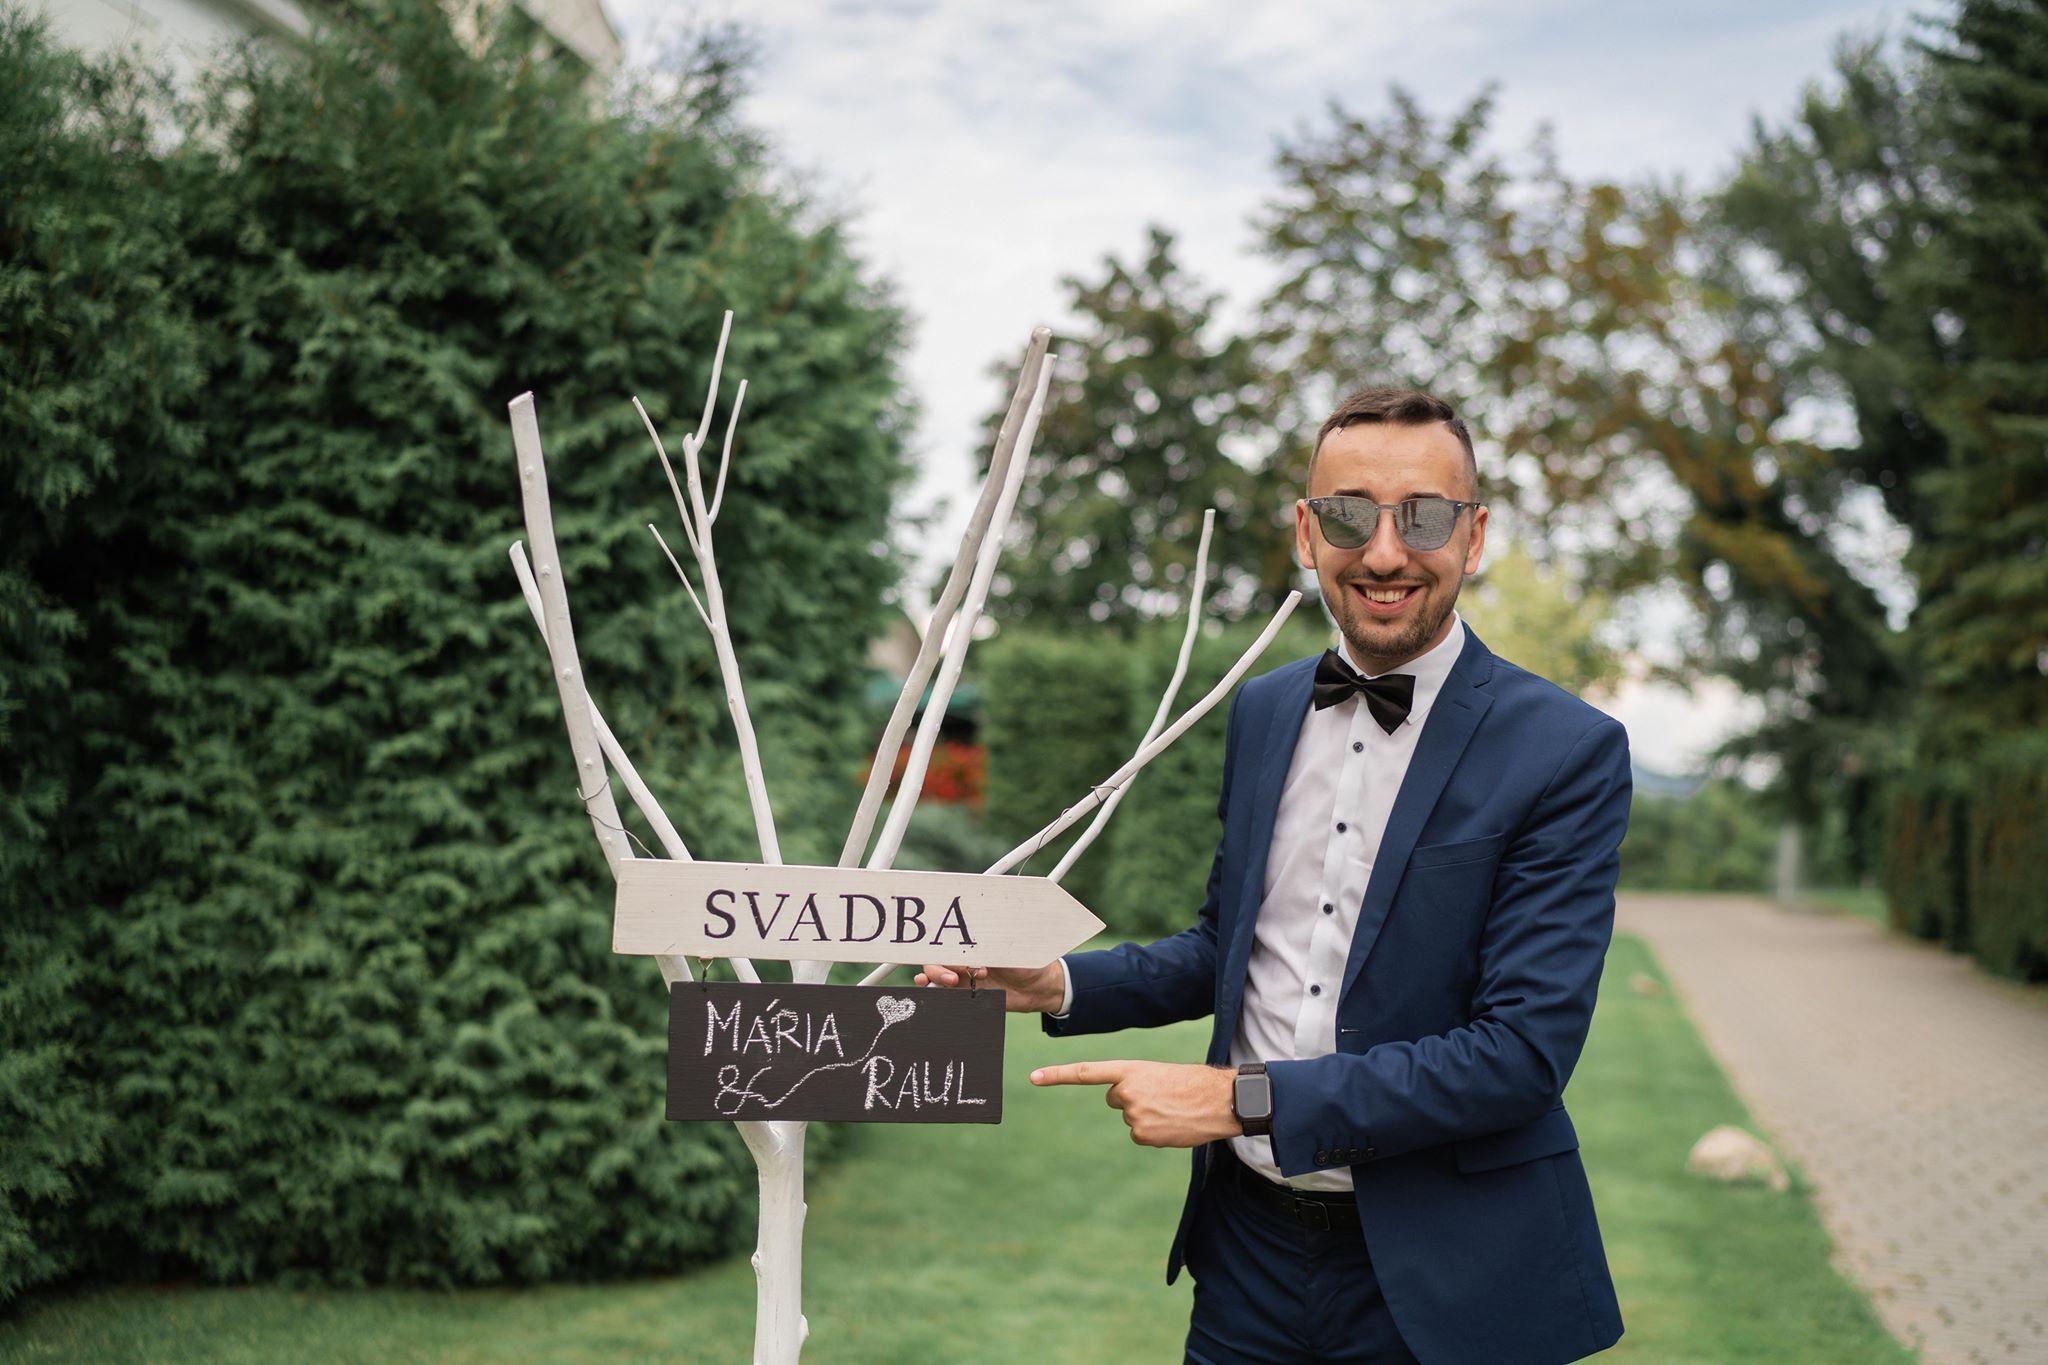 svadobny-dj-moderator-wedding-moderate-slovakiajpg